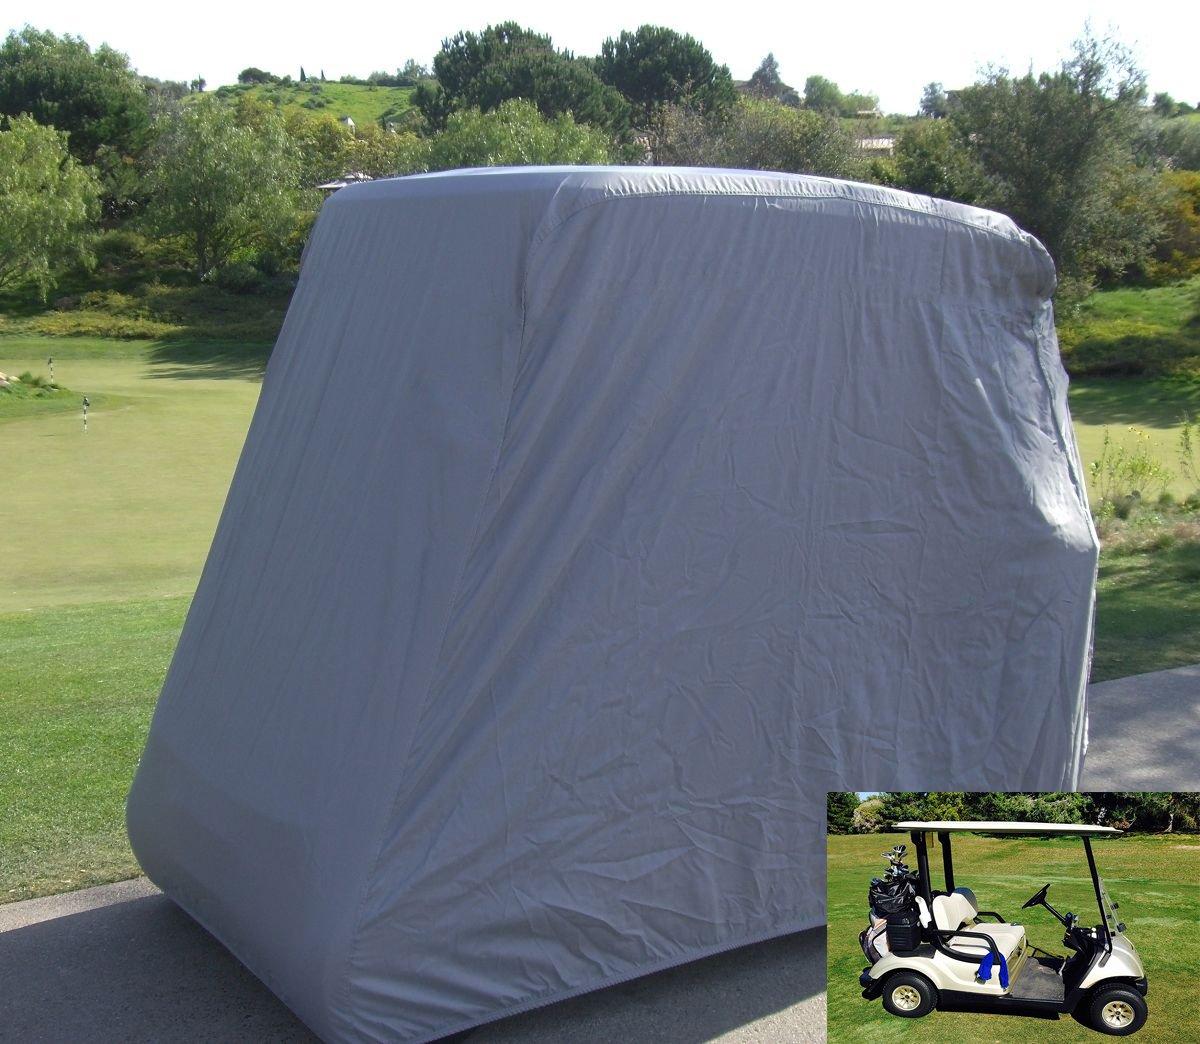 2 Passenger防水防塵ゴルフカートカバーby Lmeison Fits Ez Go、クラブ、車とYamahaゴルフカート,グレー   B07DR5BP49